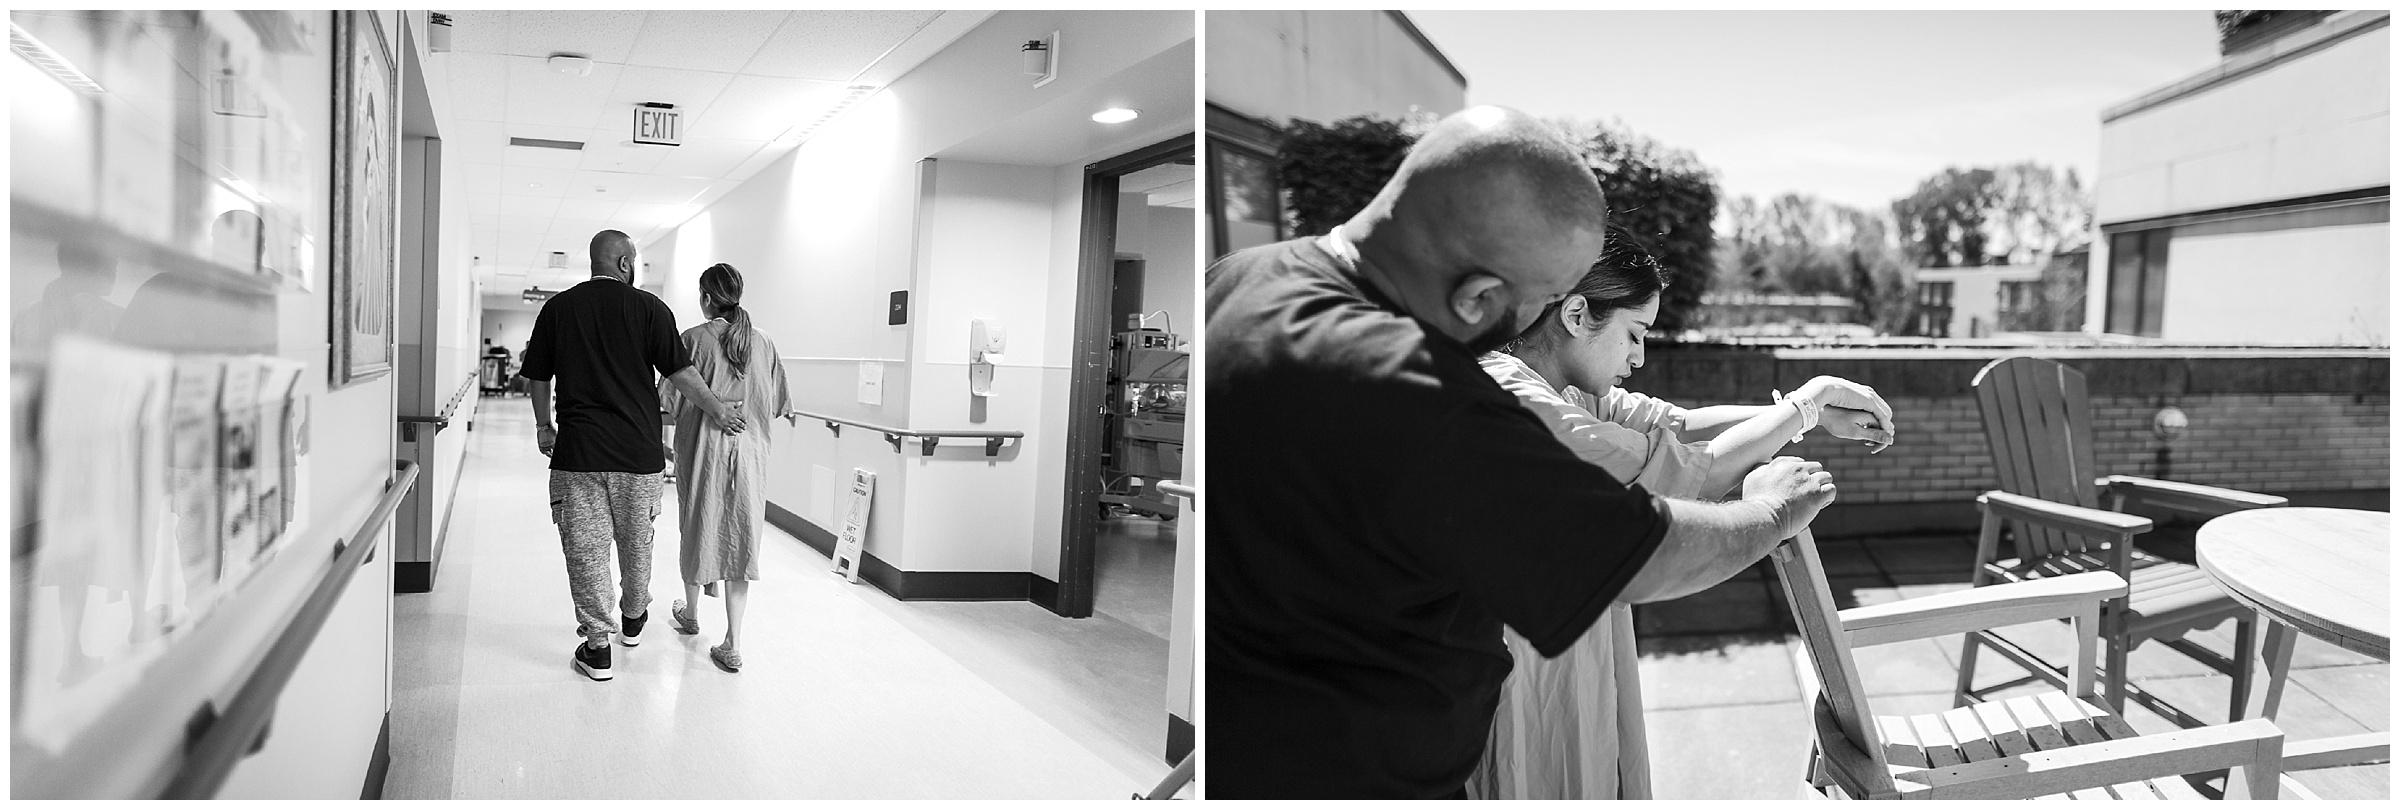 hospital-surrey-memorial-birth-photography